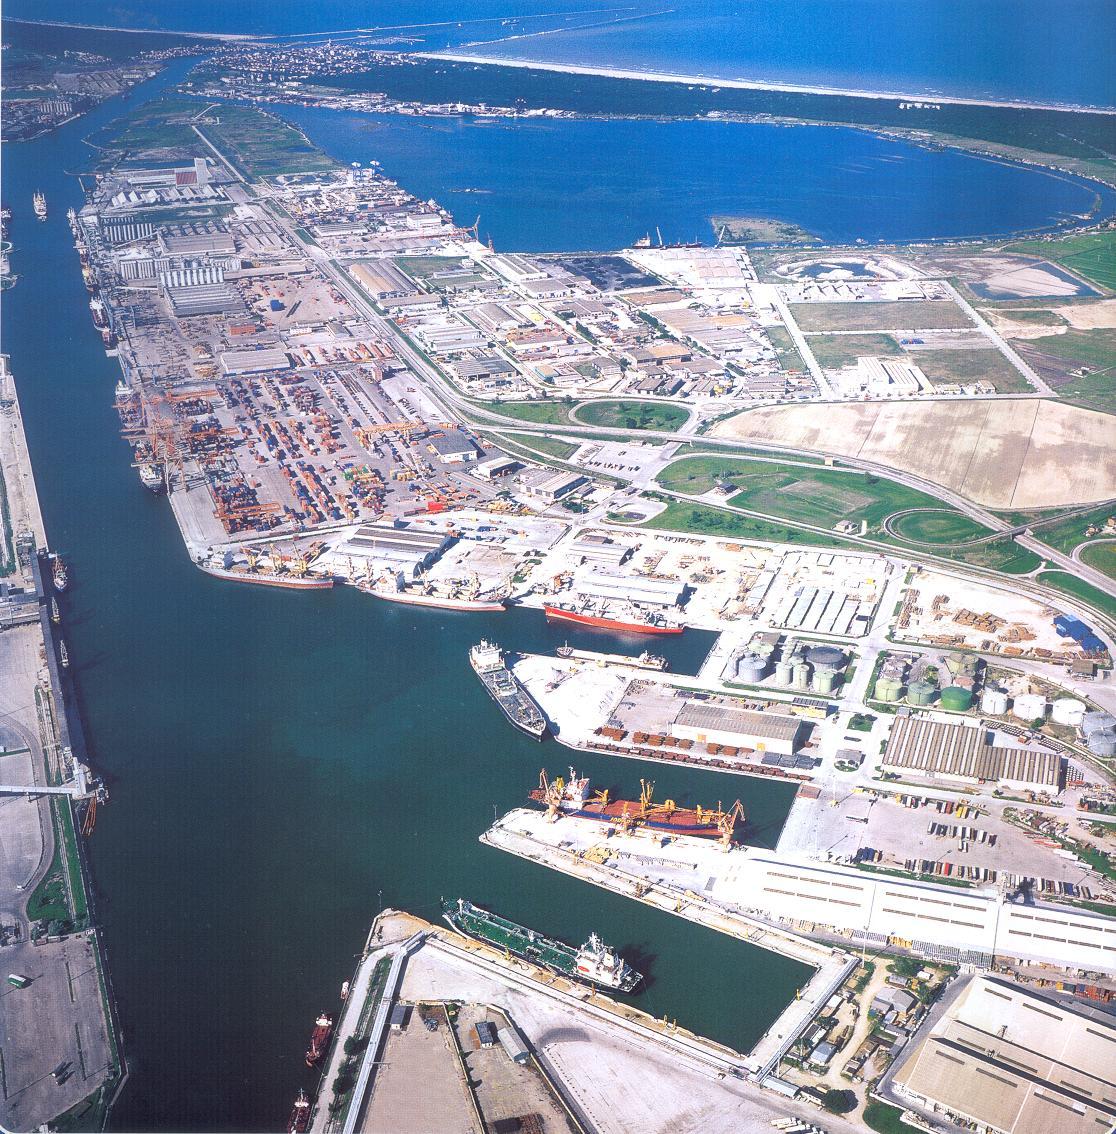 Porto di Ravenna, in crescita i traffici